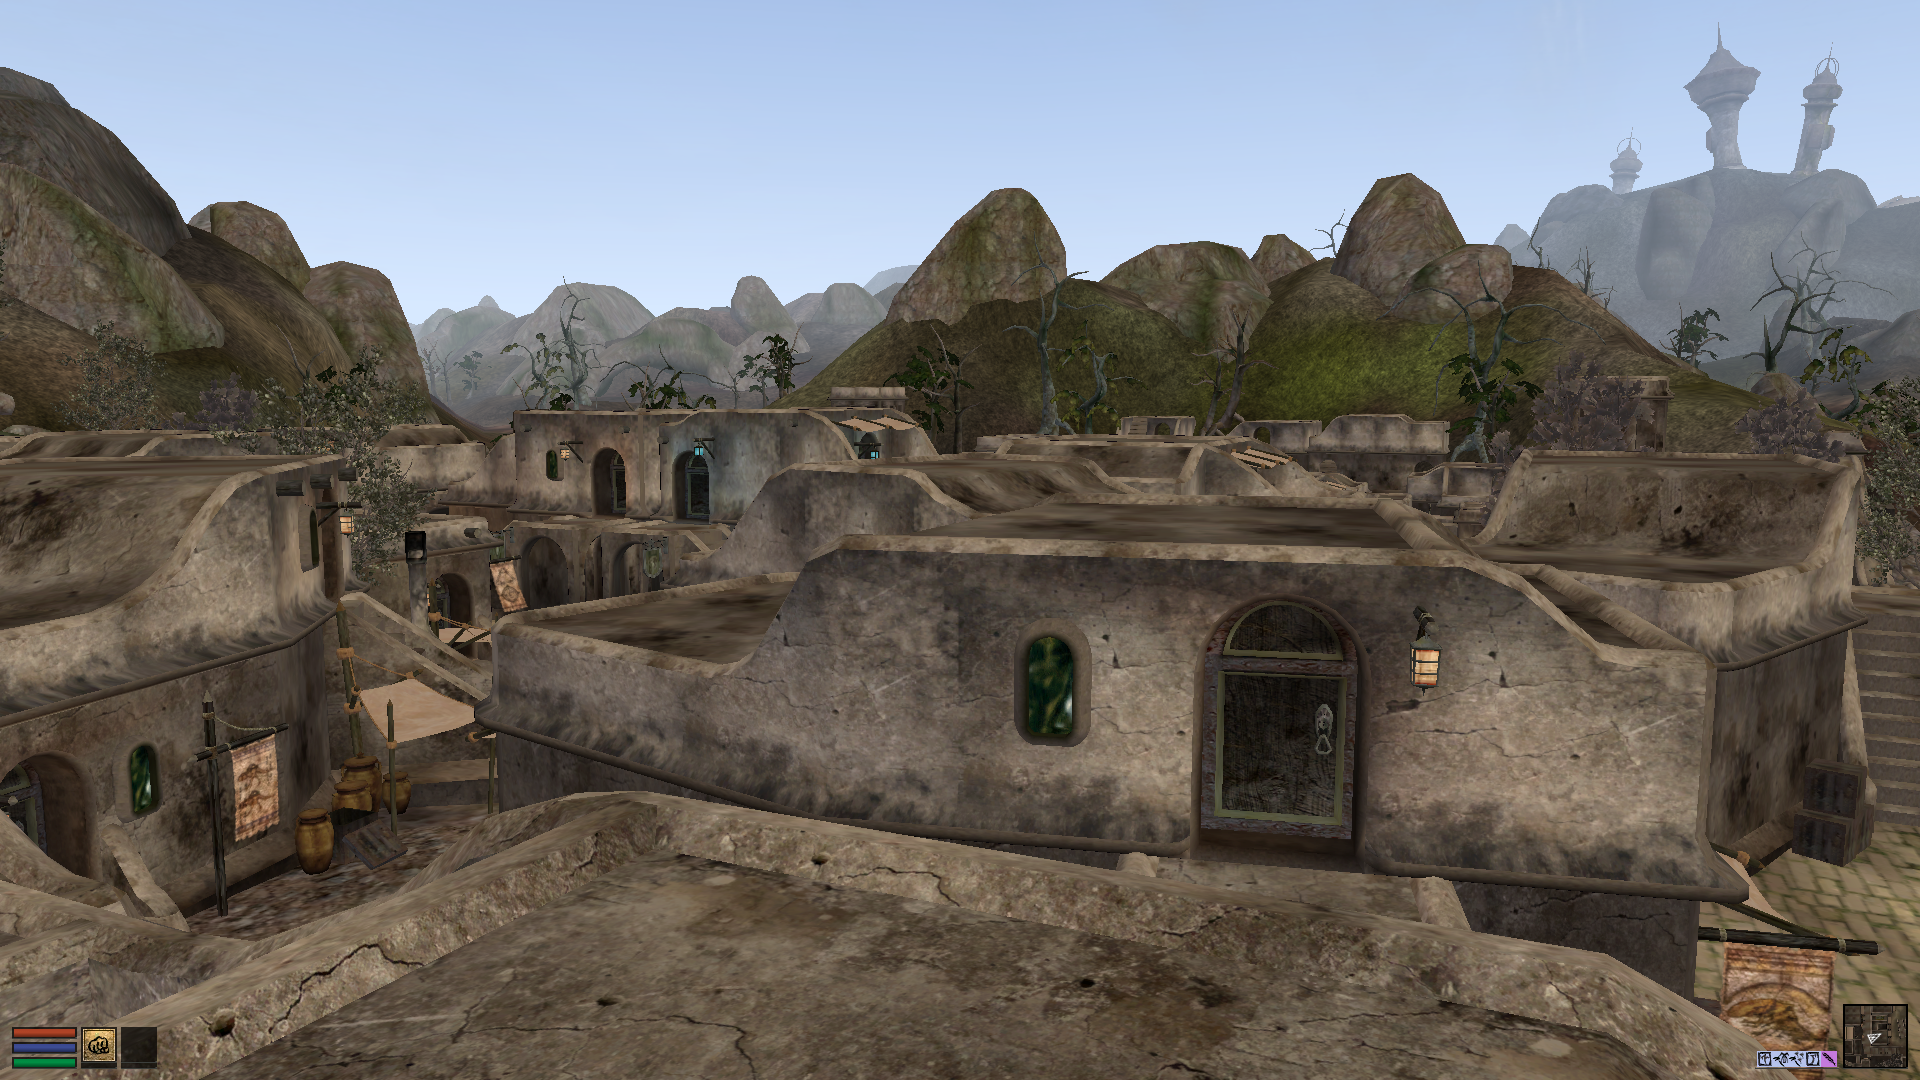 Morrowind: Rebirth overhaul mod just had its biggest update | PC Gamer